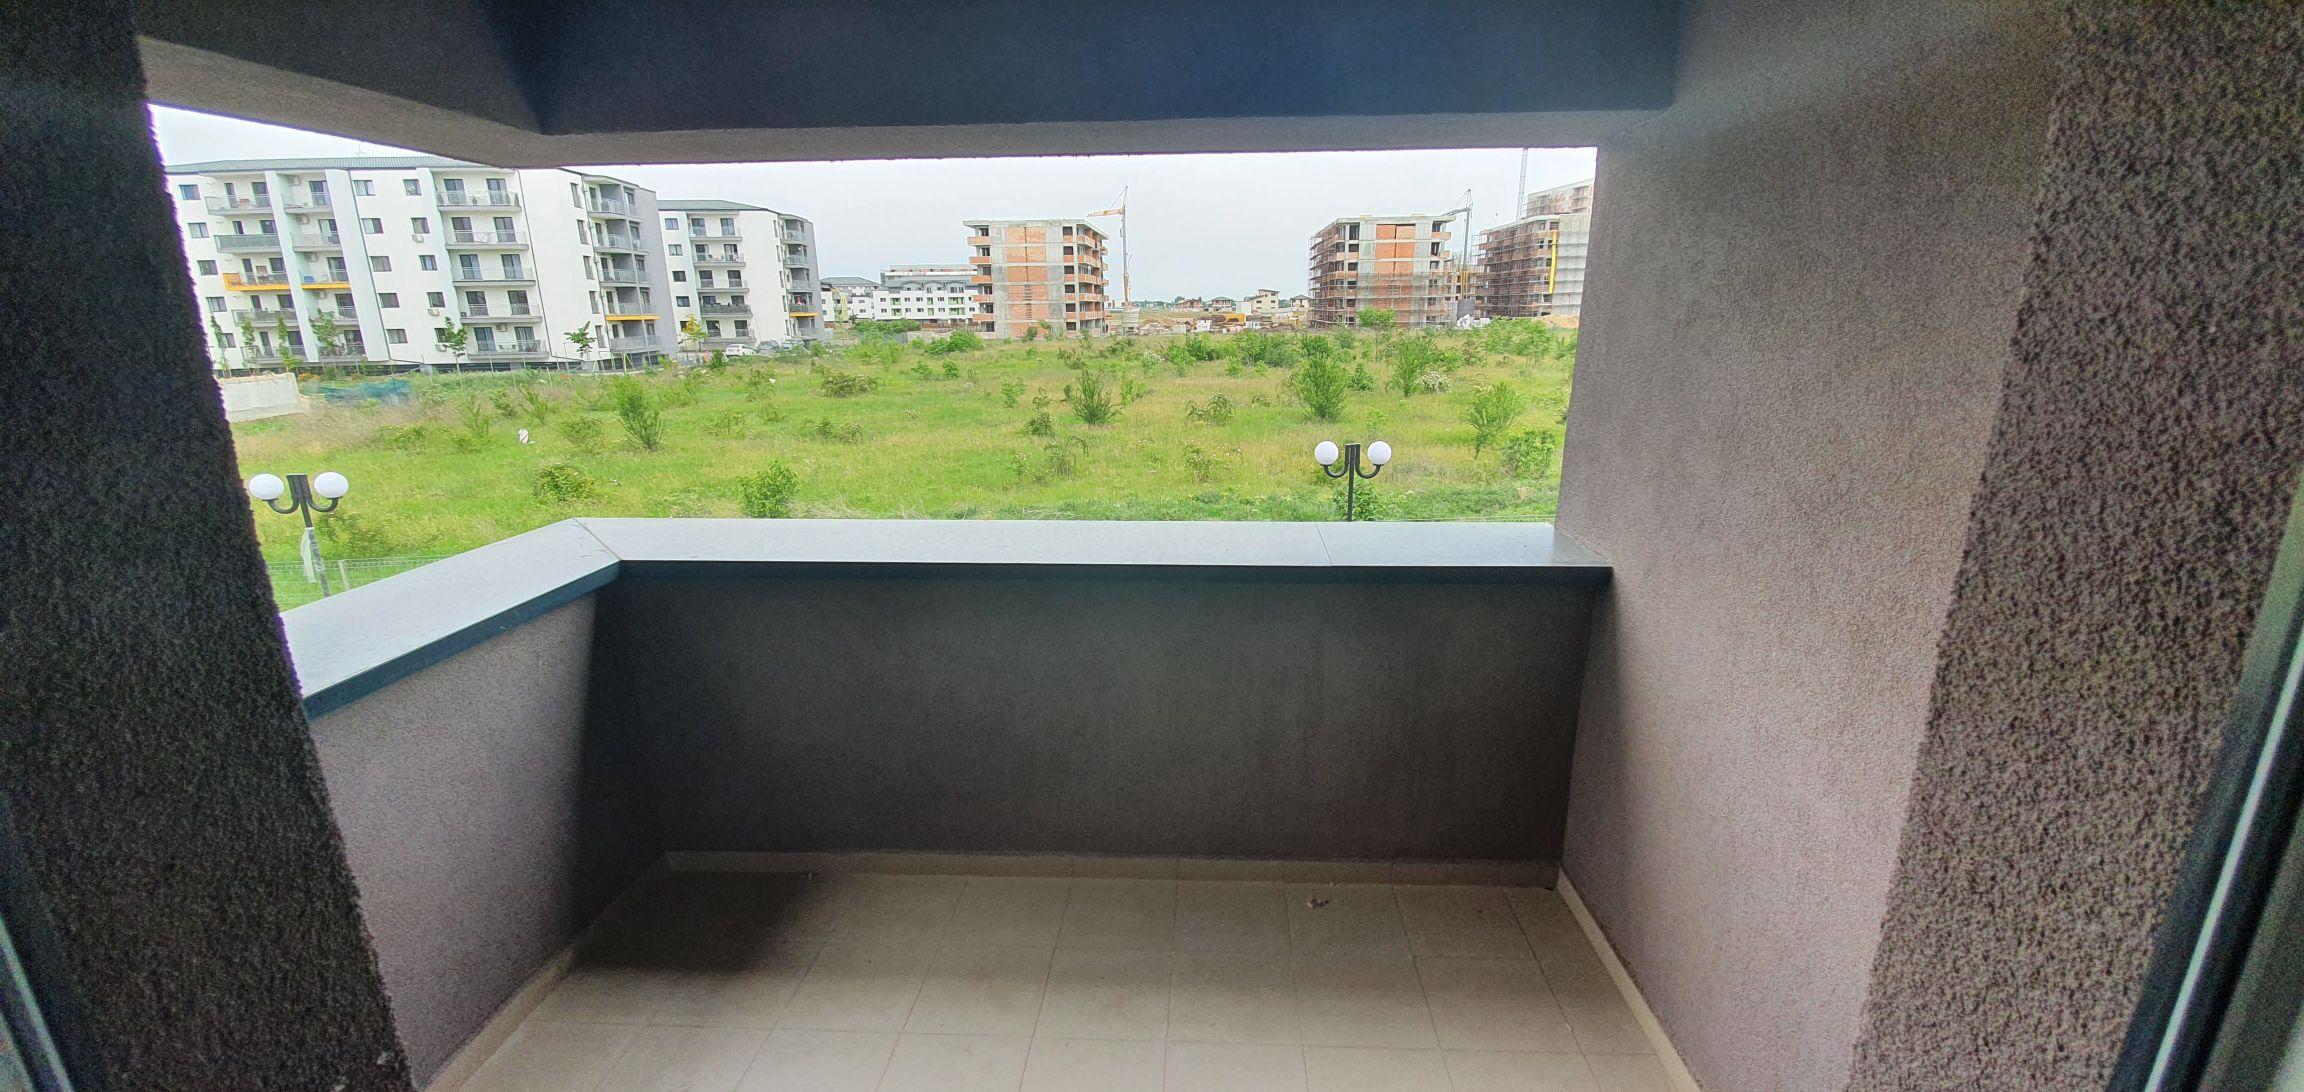 Bloc 2 - Etaj 1 - Apartament 08 - Terasa